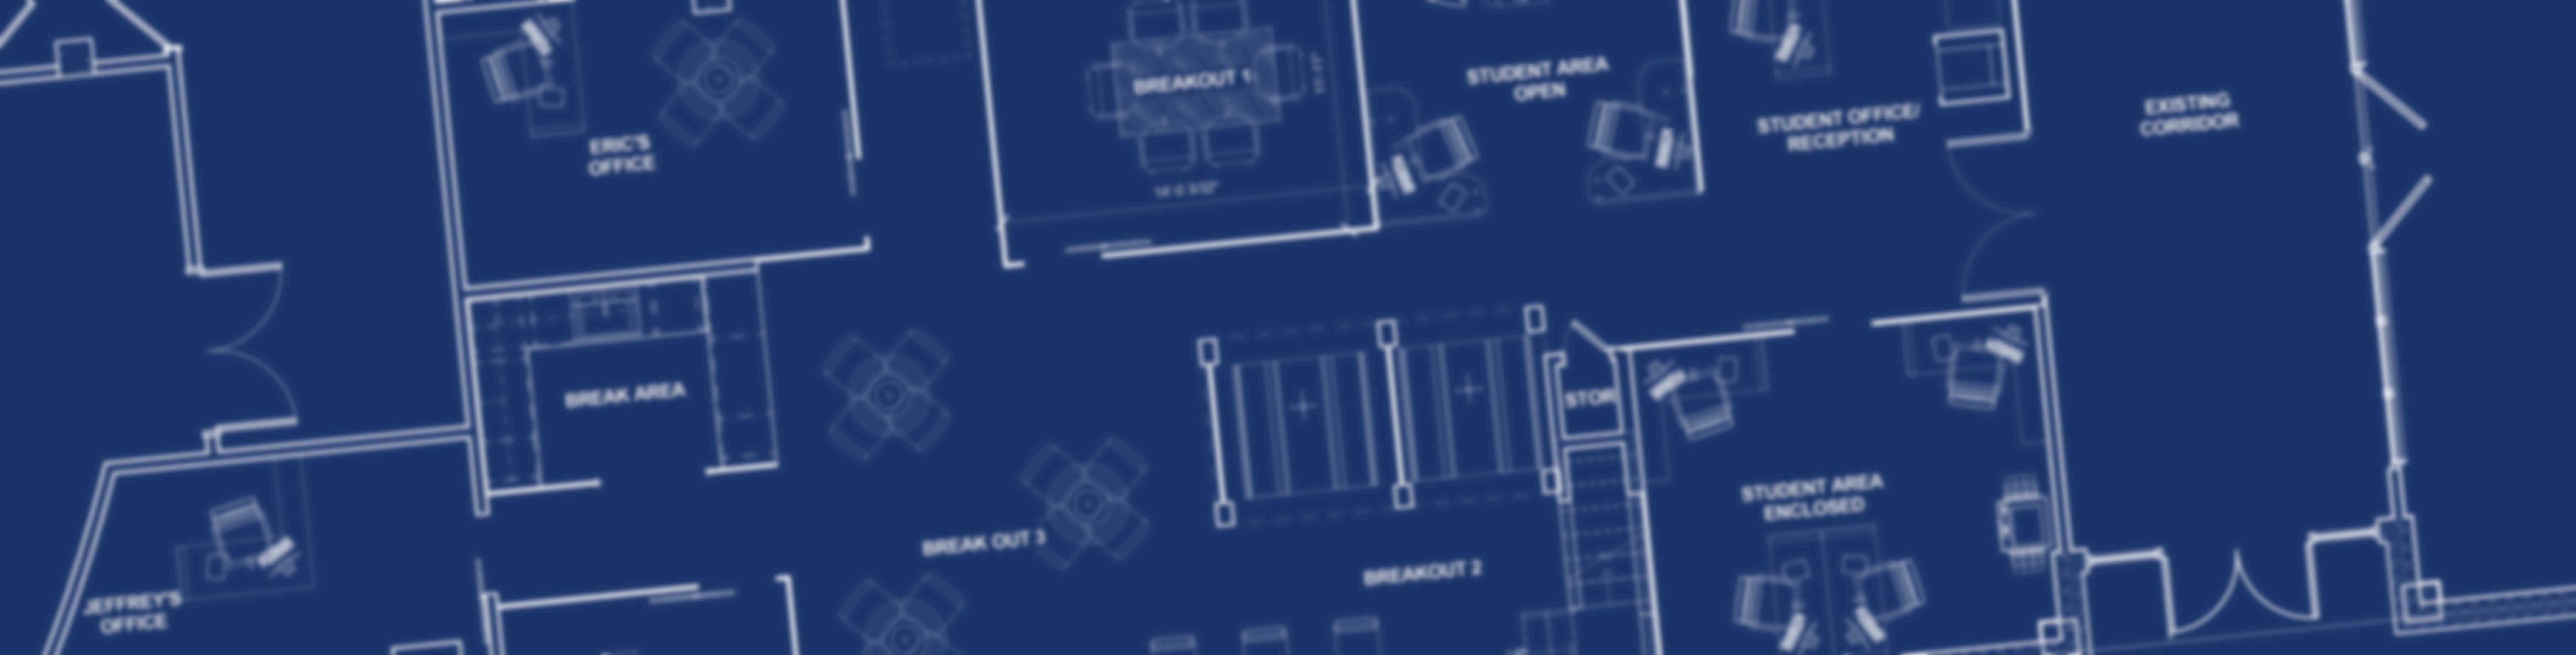 blueprints_banner_blur_blu2